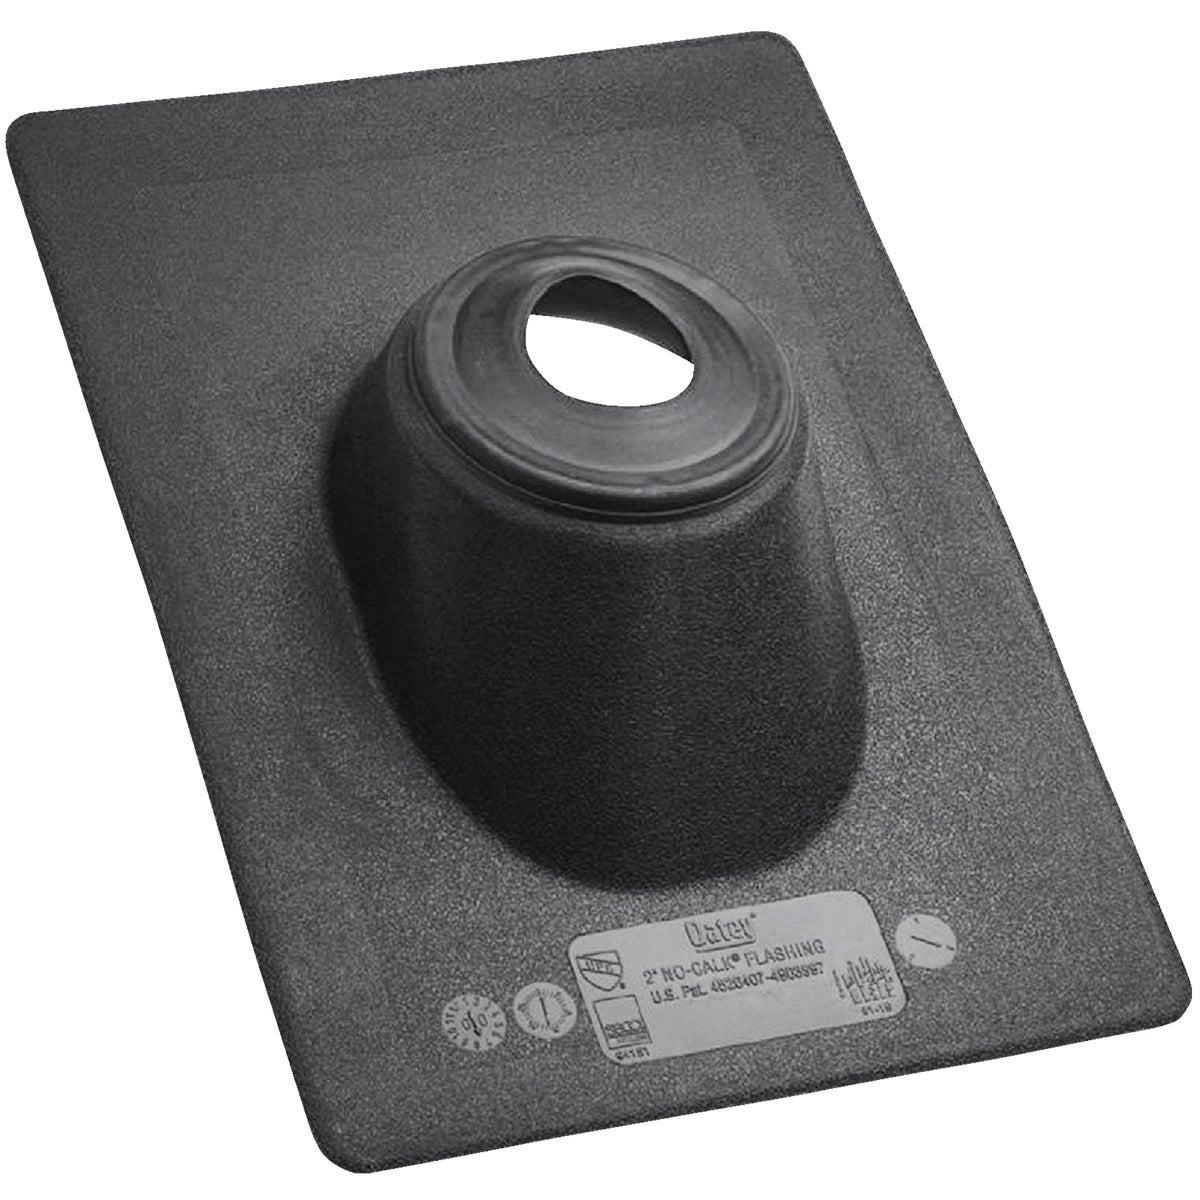 No-Caulk Flashing With Thermoplastic Base